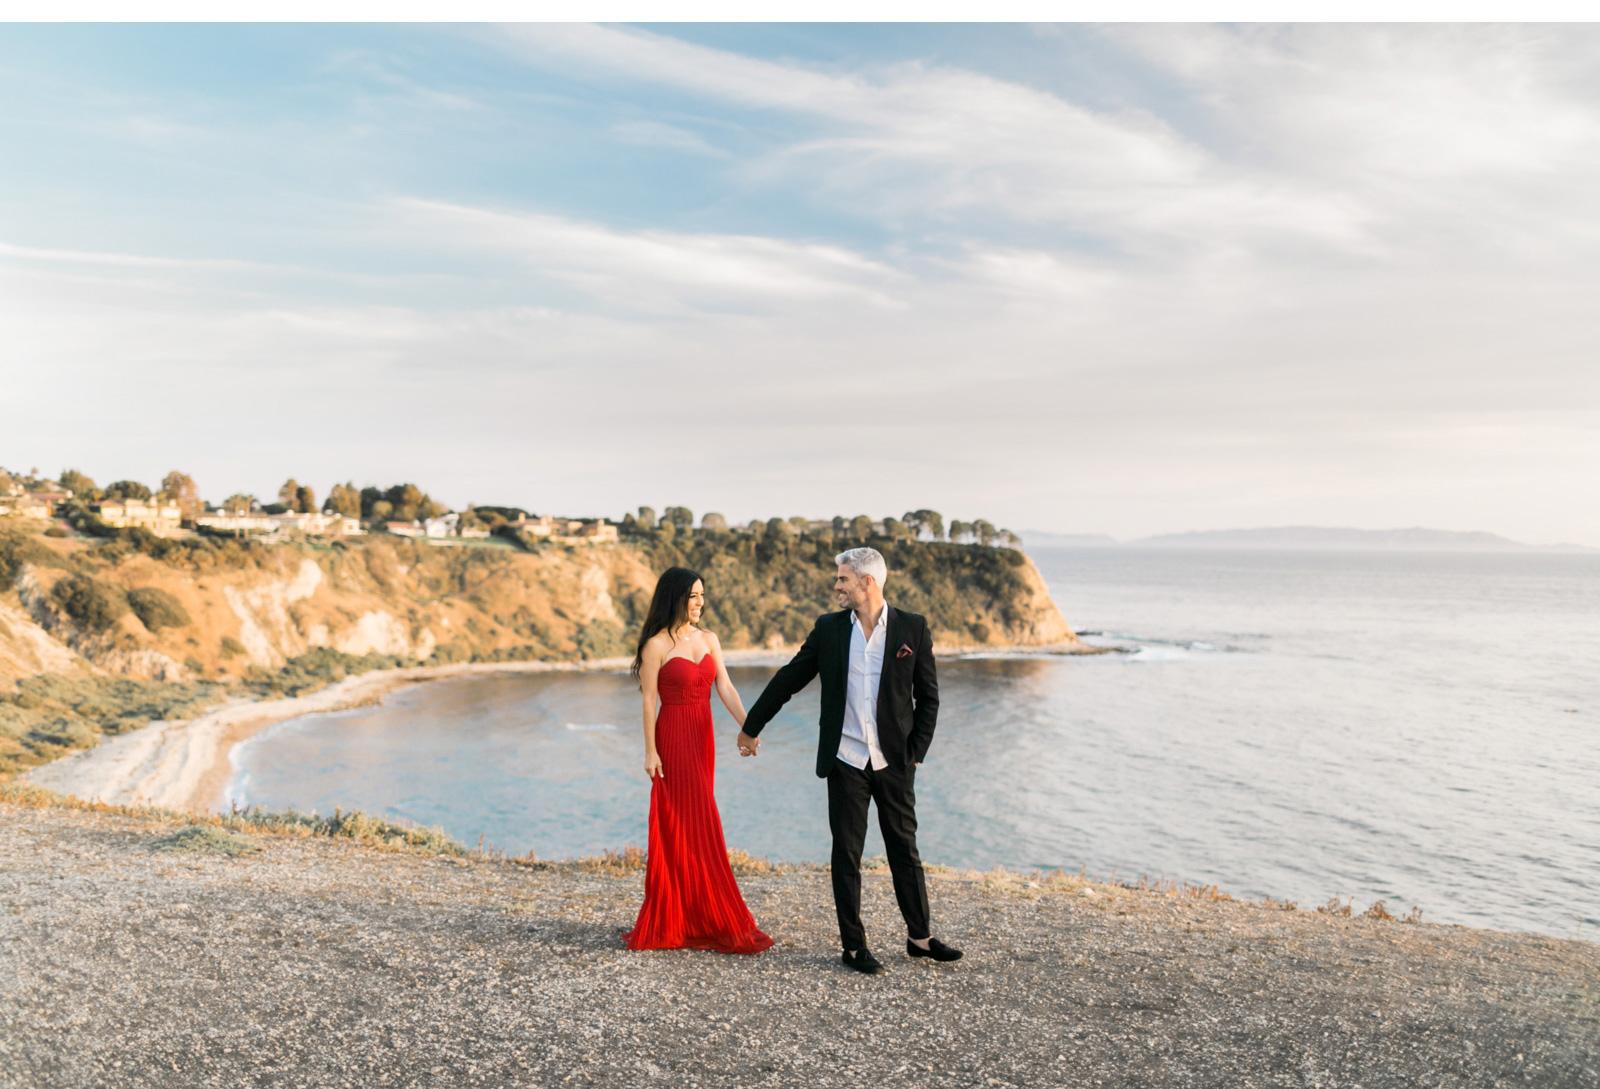 Santa-Barbara-Wedding-Photographer-Natalie-Schutt-Photography_23.jpg